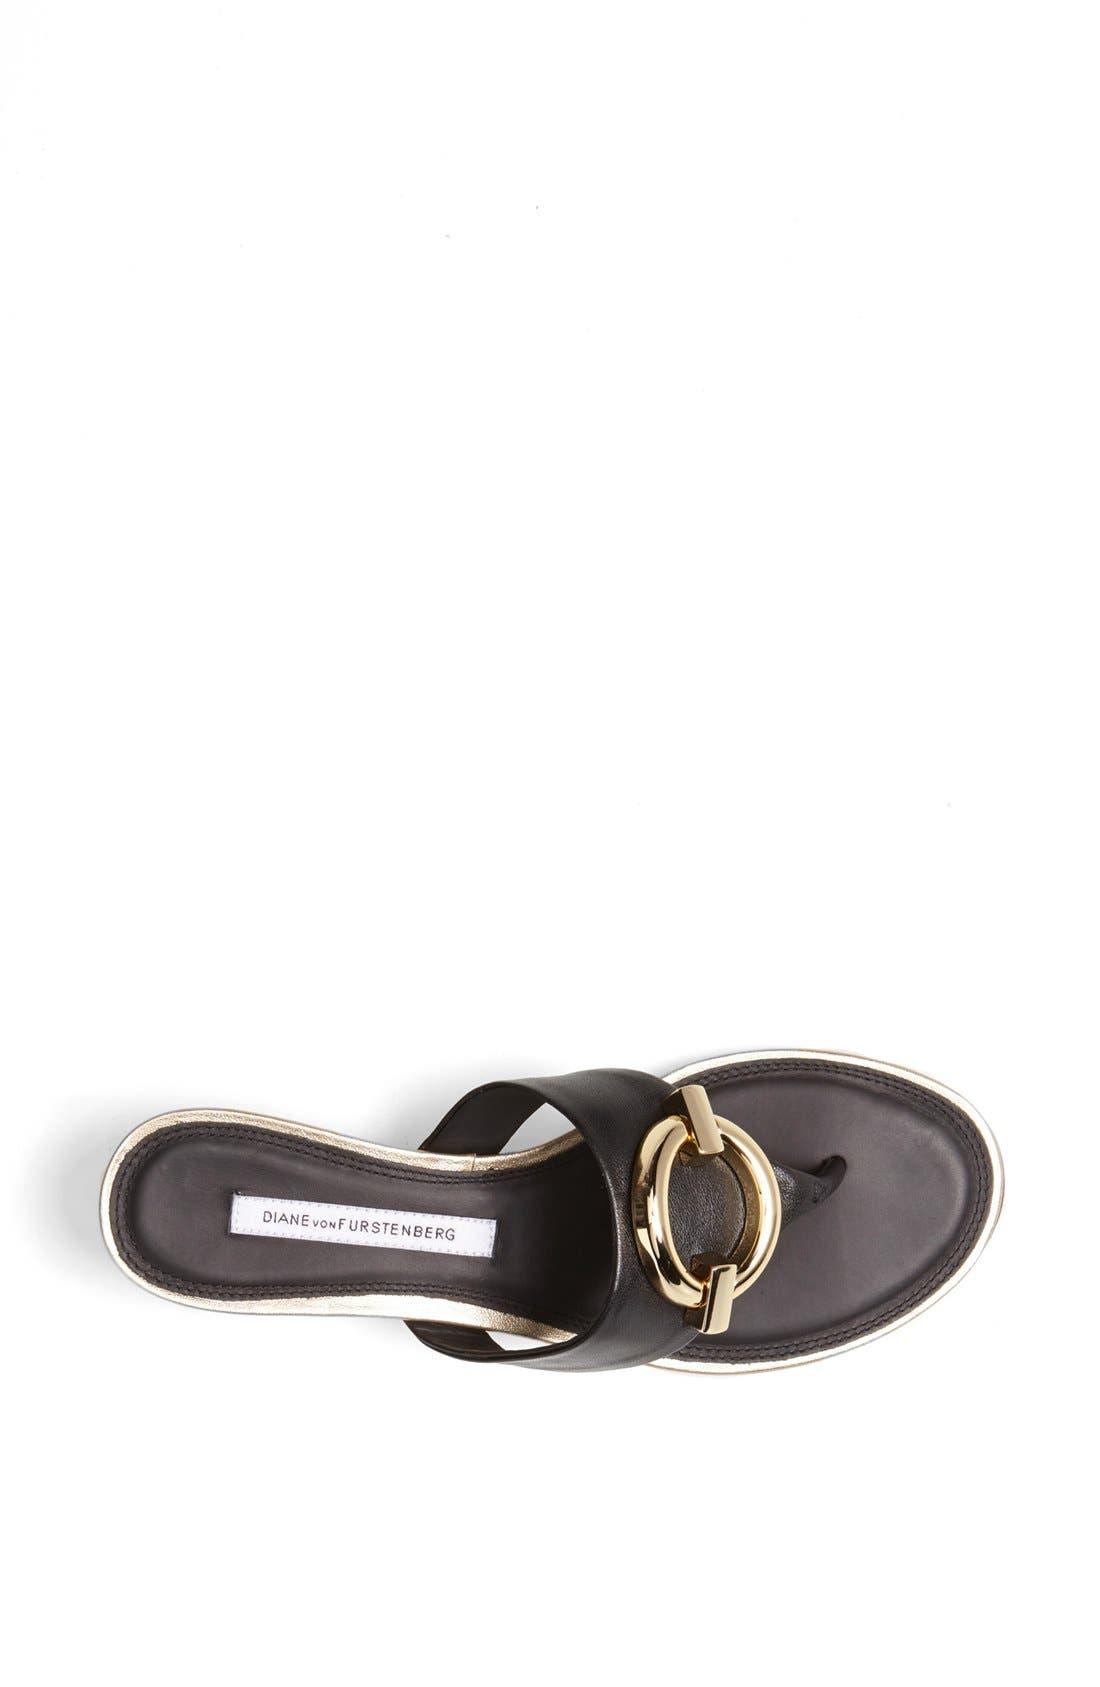 Alternate Image 3  - Diane von Furstenberg 'Tiles' Leather Sandal